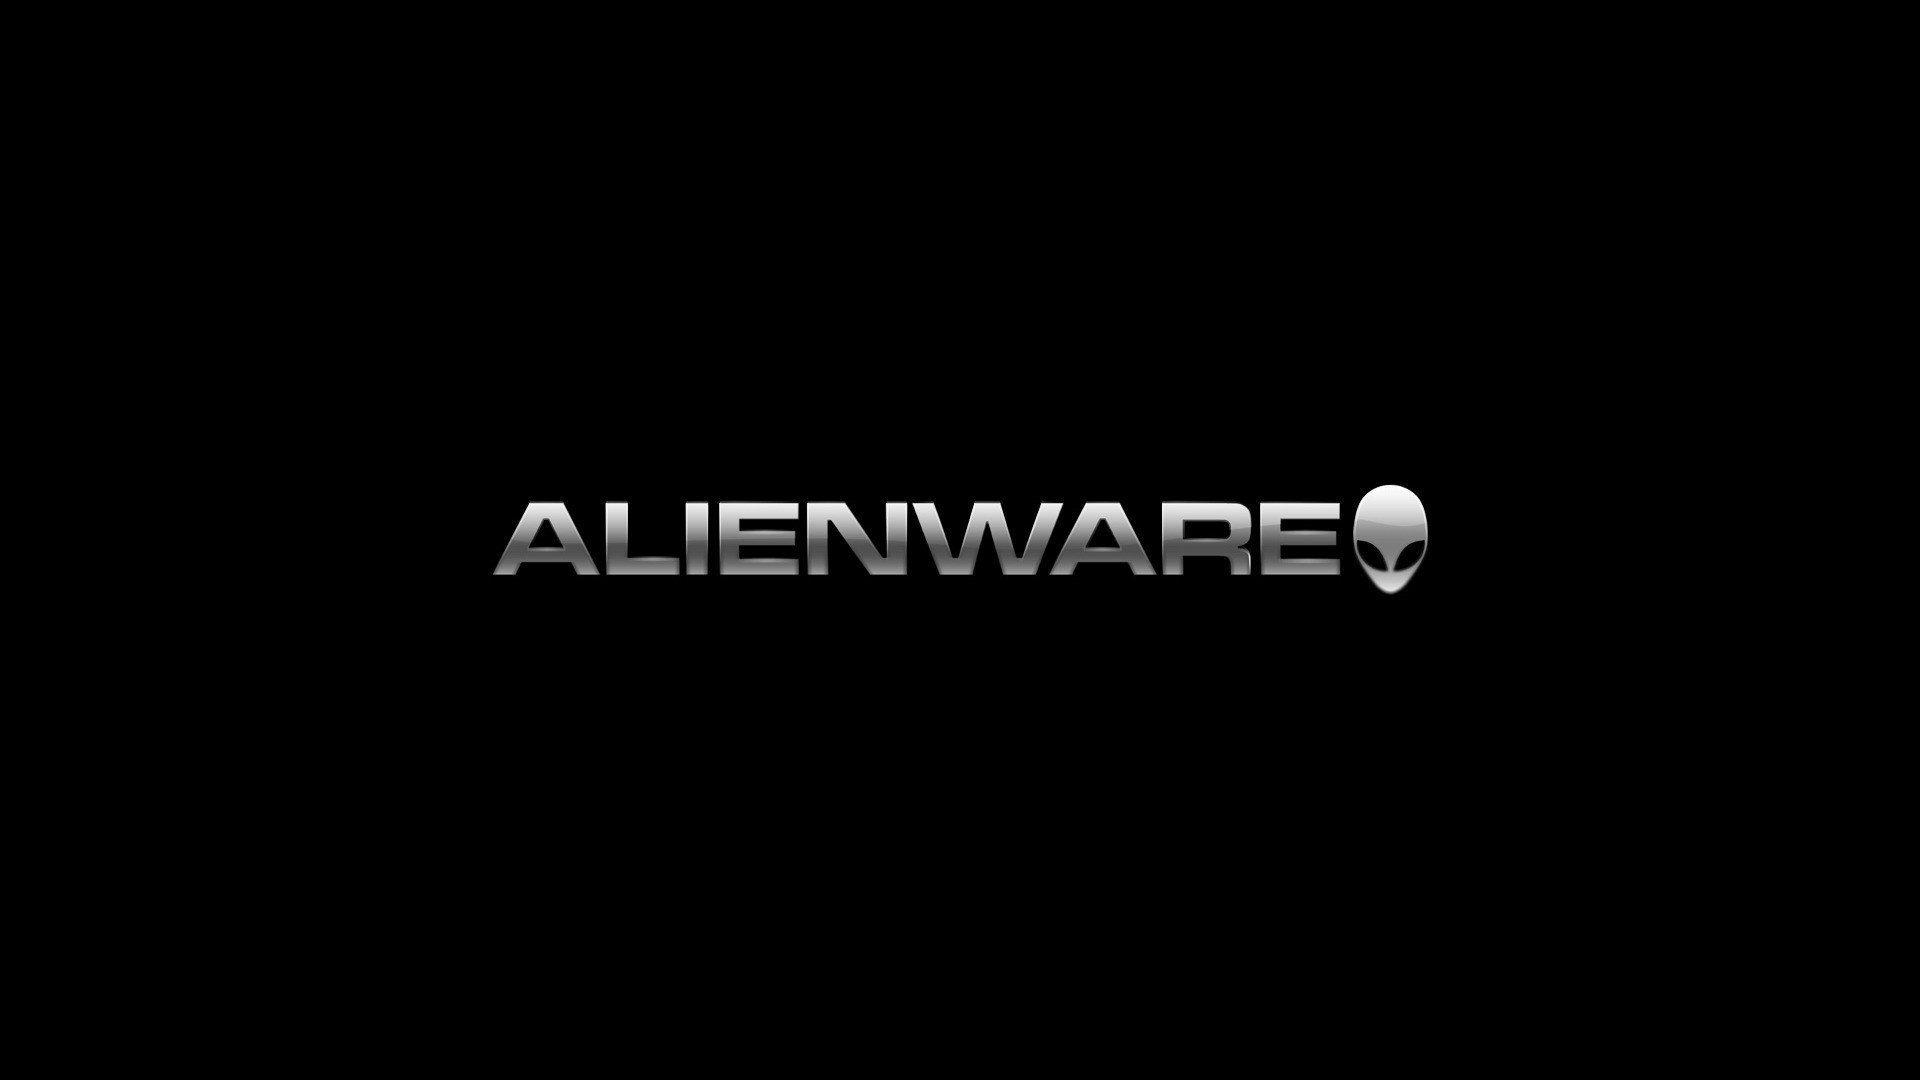 Fabelhaft 4K Alienware Wallpaper (72+ images) #OQ_55